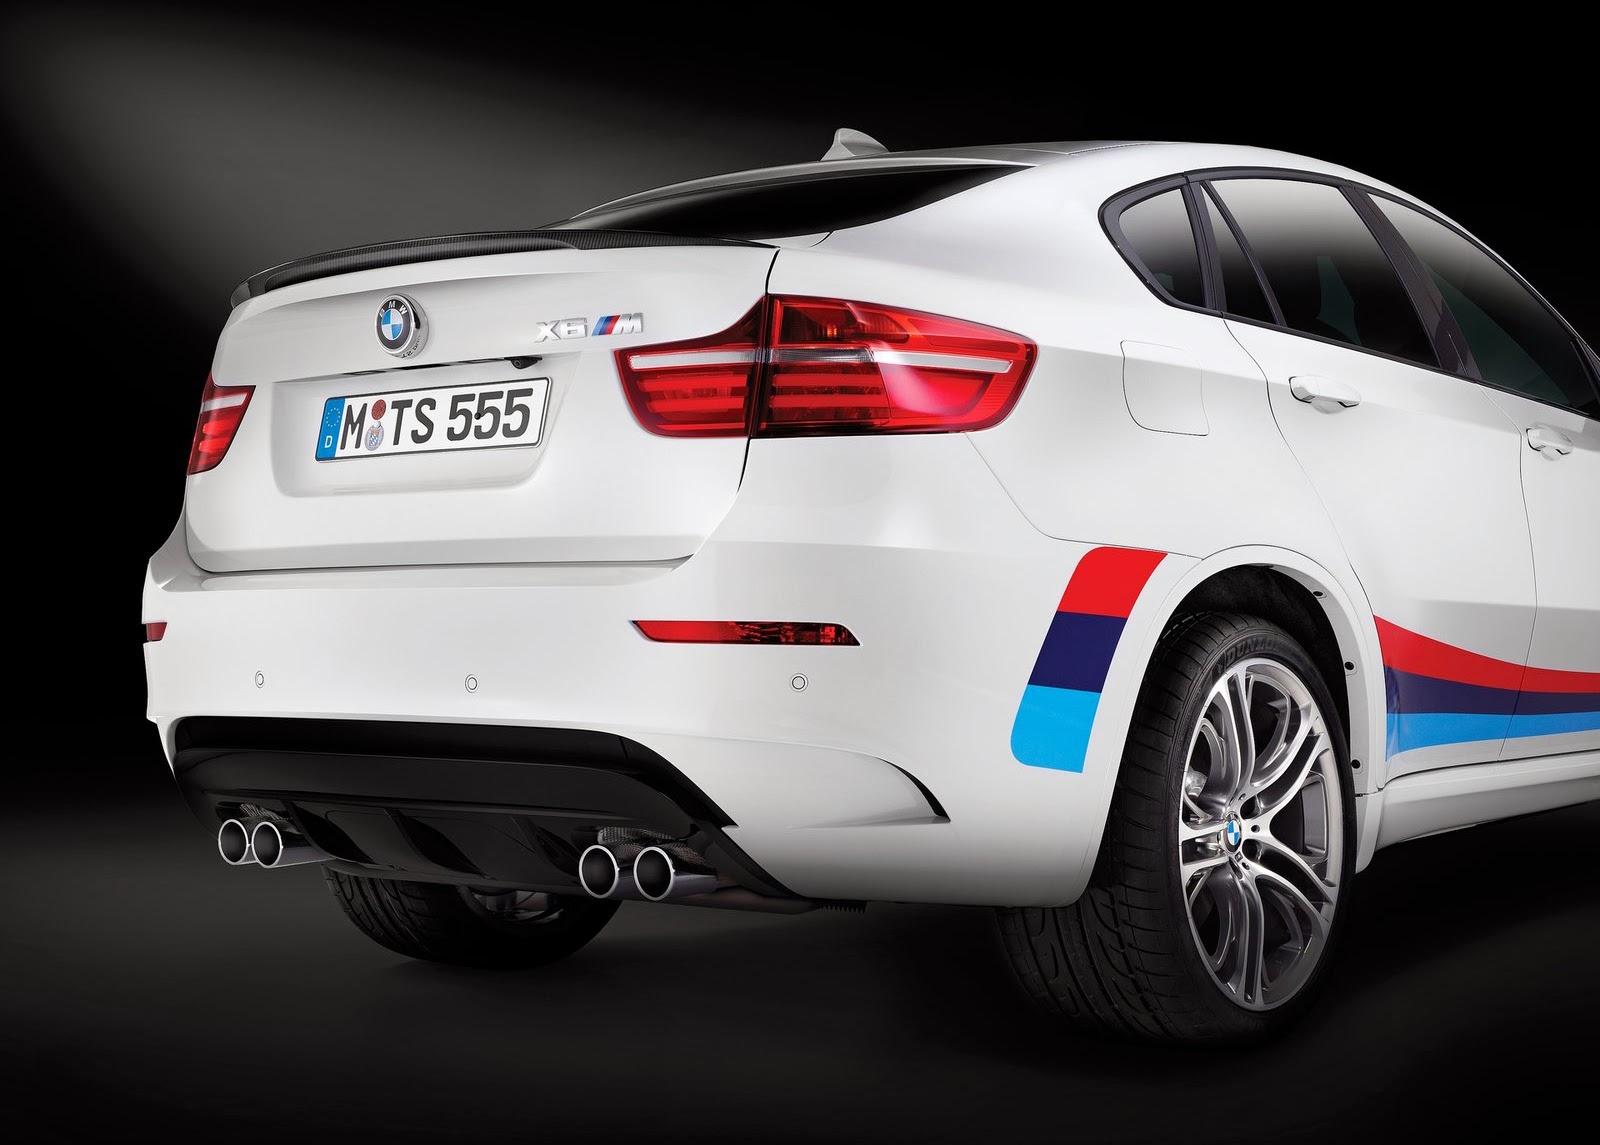 2014+BMW+X6+M+Design+Edition+%25282%2529